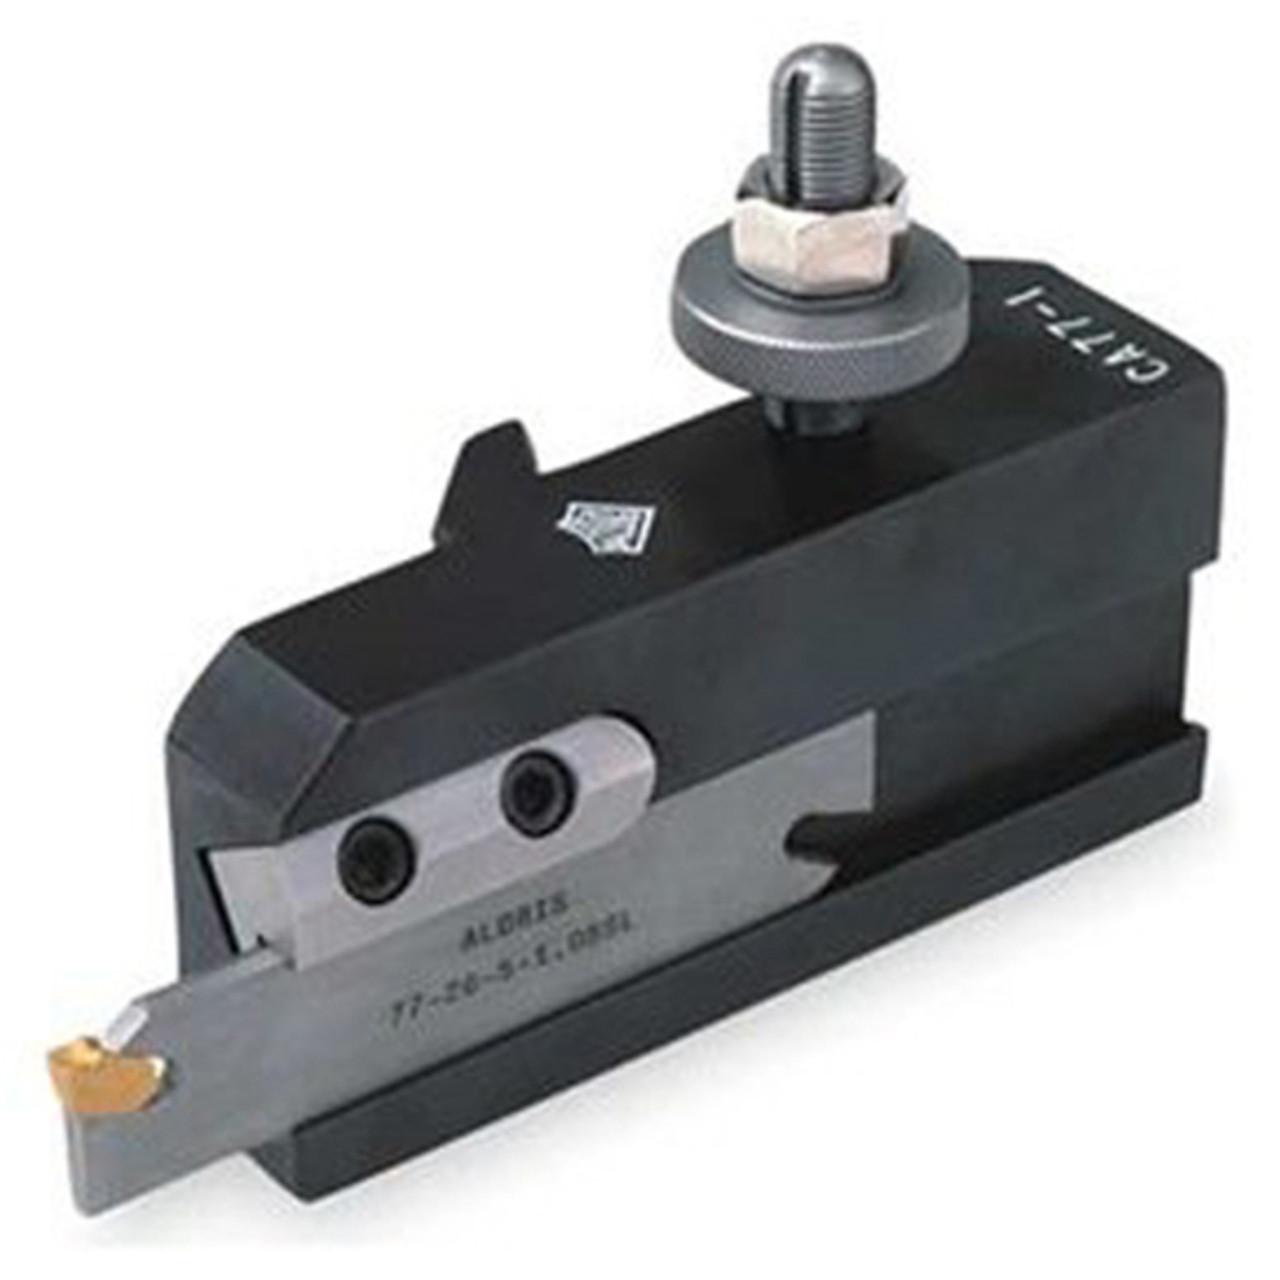 Aloris Tool DA-71 Cut-Off and Grooving Holder